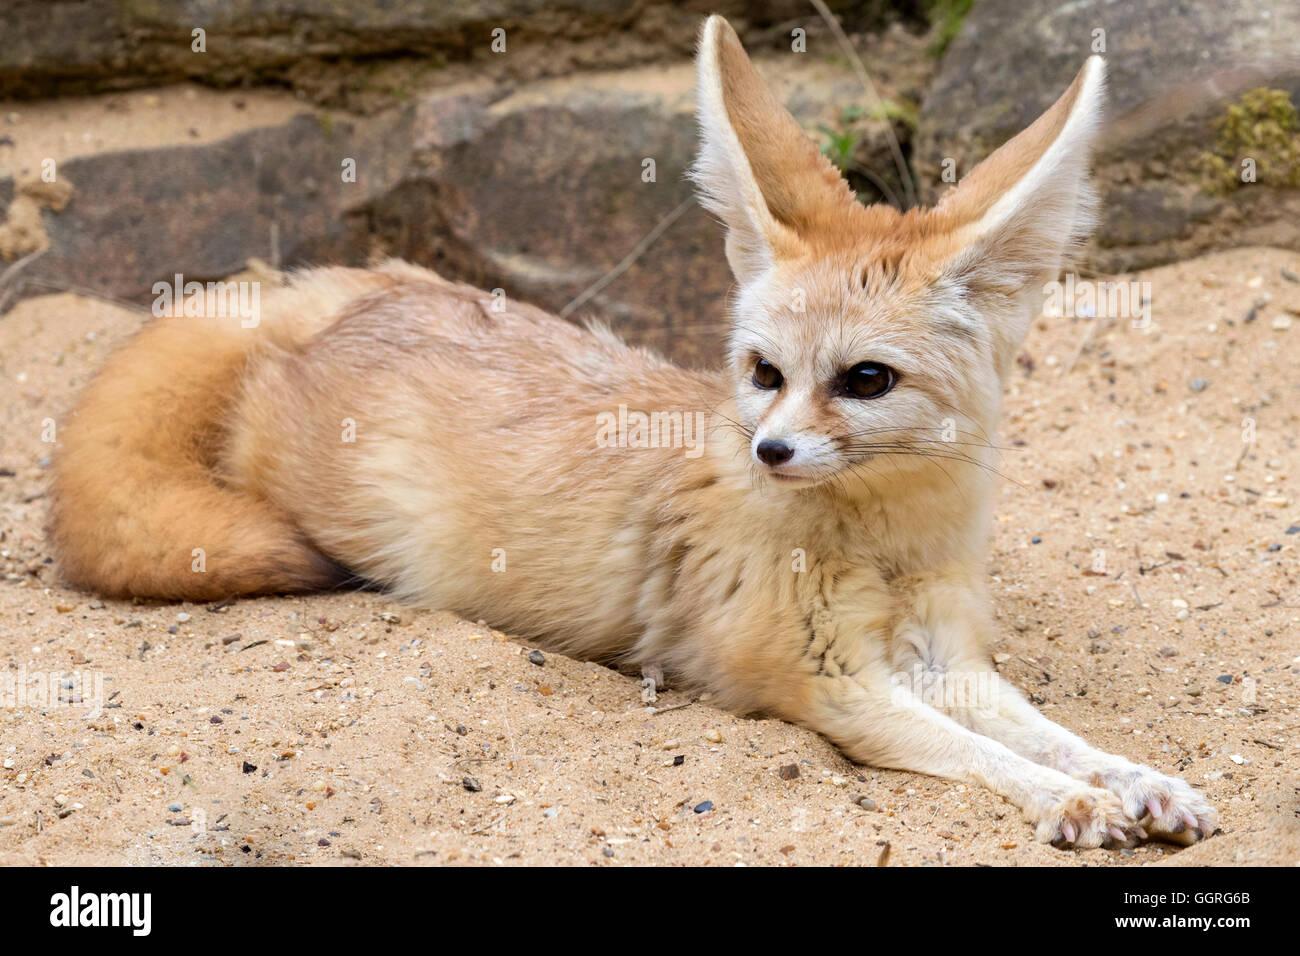 fennec fox vulpes zerda stock photos u0026 fennec fox vulpes zerda